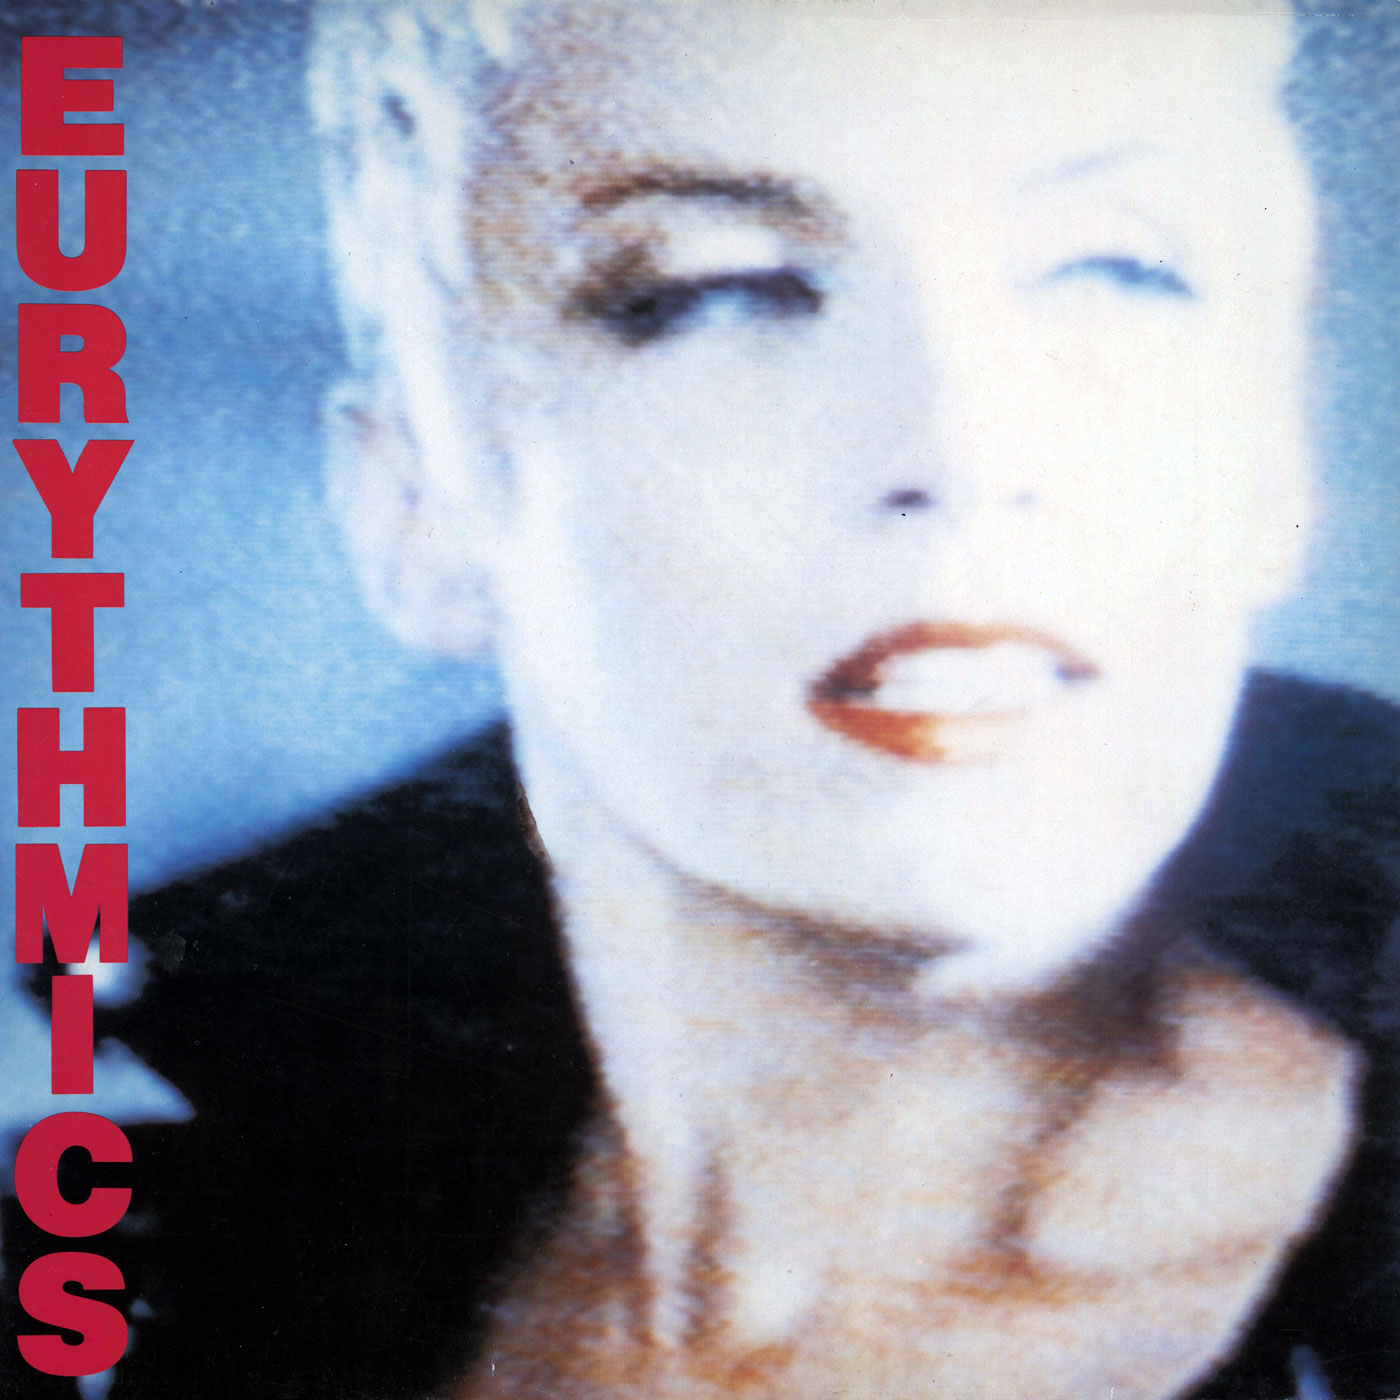 Eurythmics Be Yourself Tonight Vinyl Lover